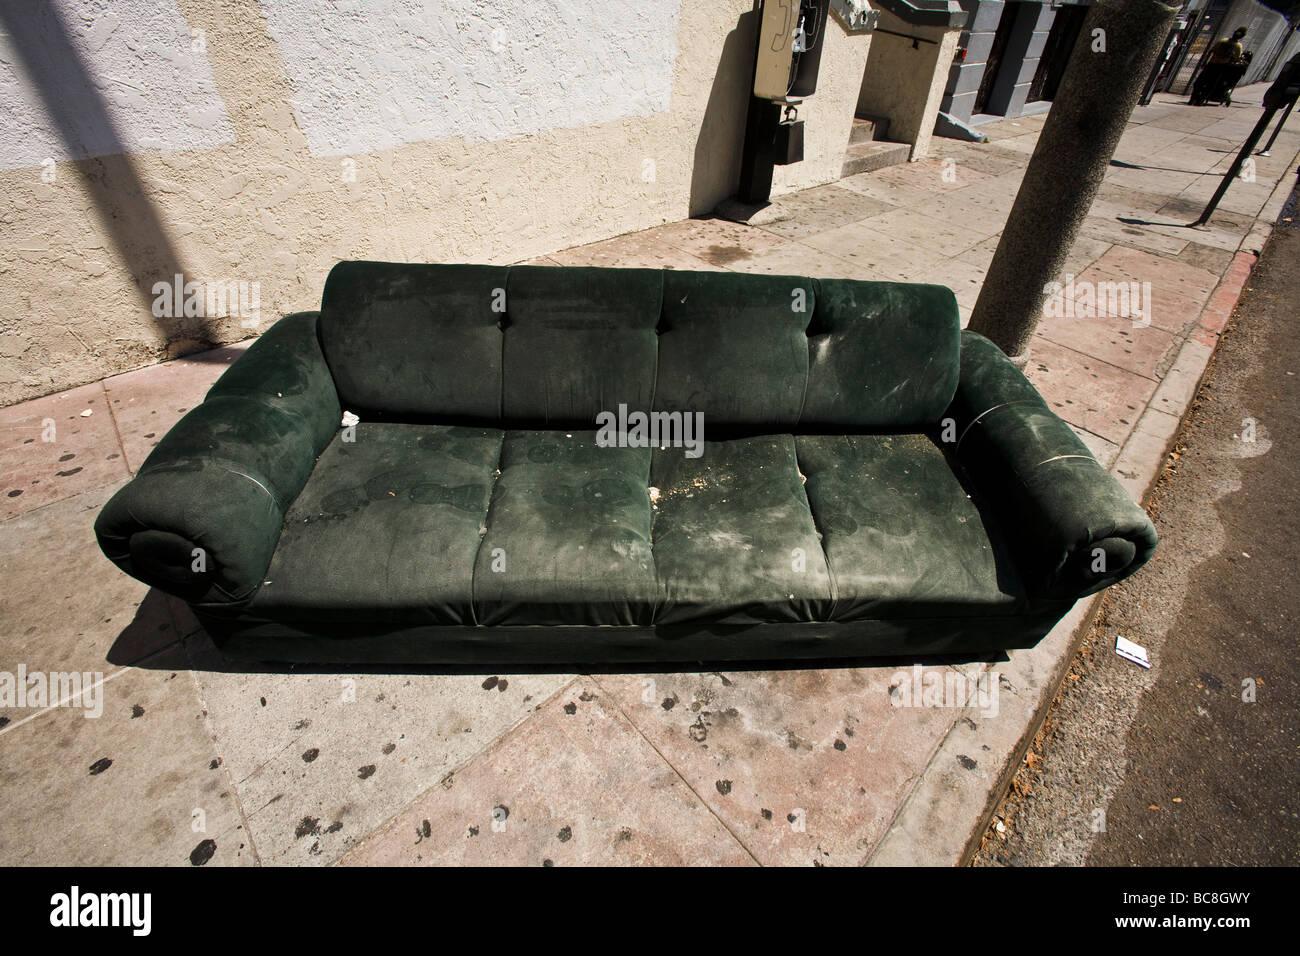 sofa army germany mart waco texas abandoned couch stock photos and